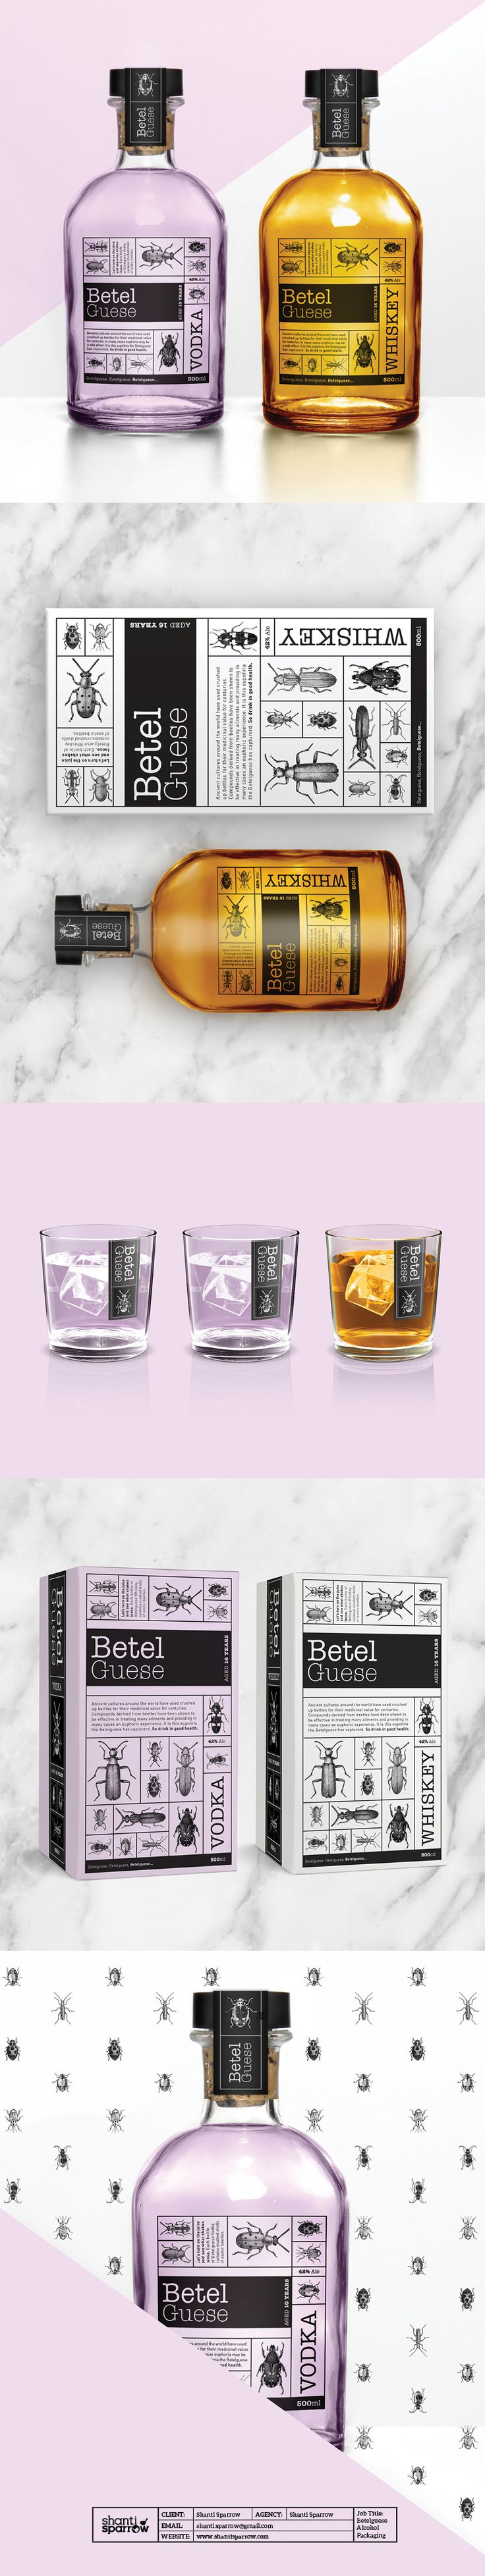 1000 images about pamela harvey design logo design betel guese whiskey on behance by shanti sparrow design brisbane pd